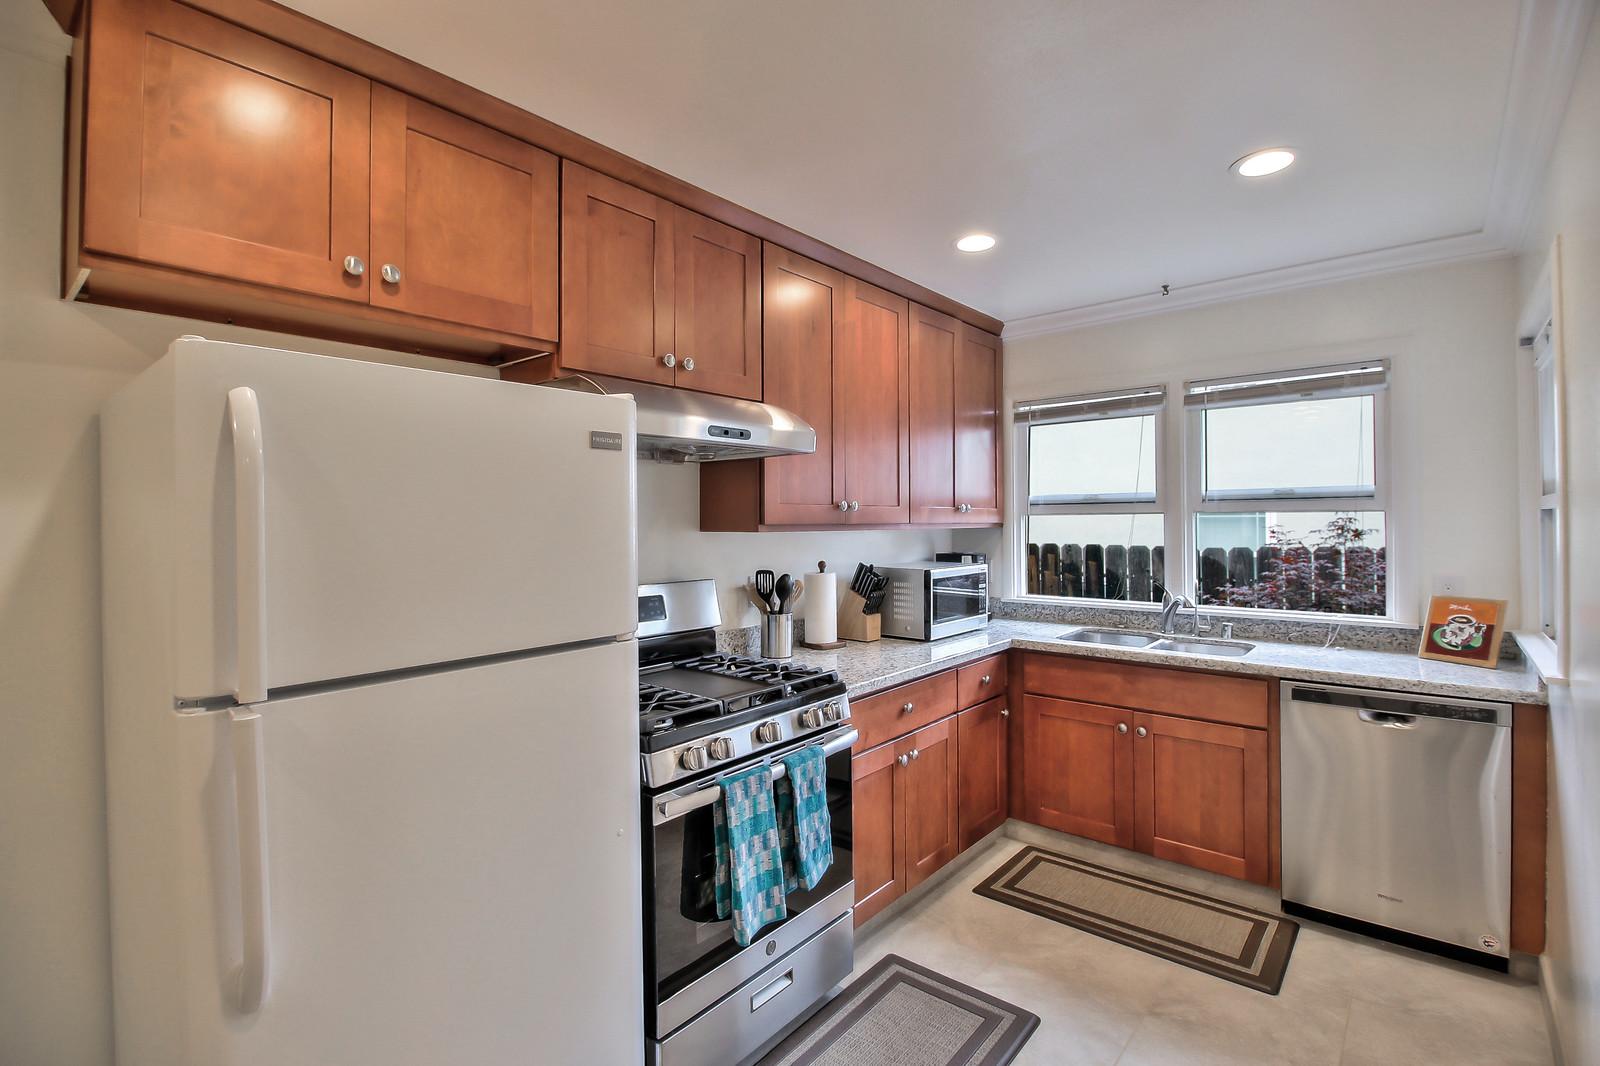 Kitchen at San Jose Duplex Apartment